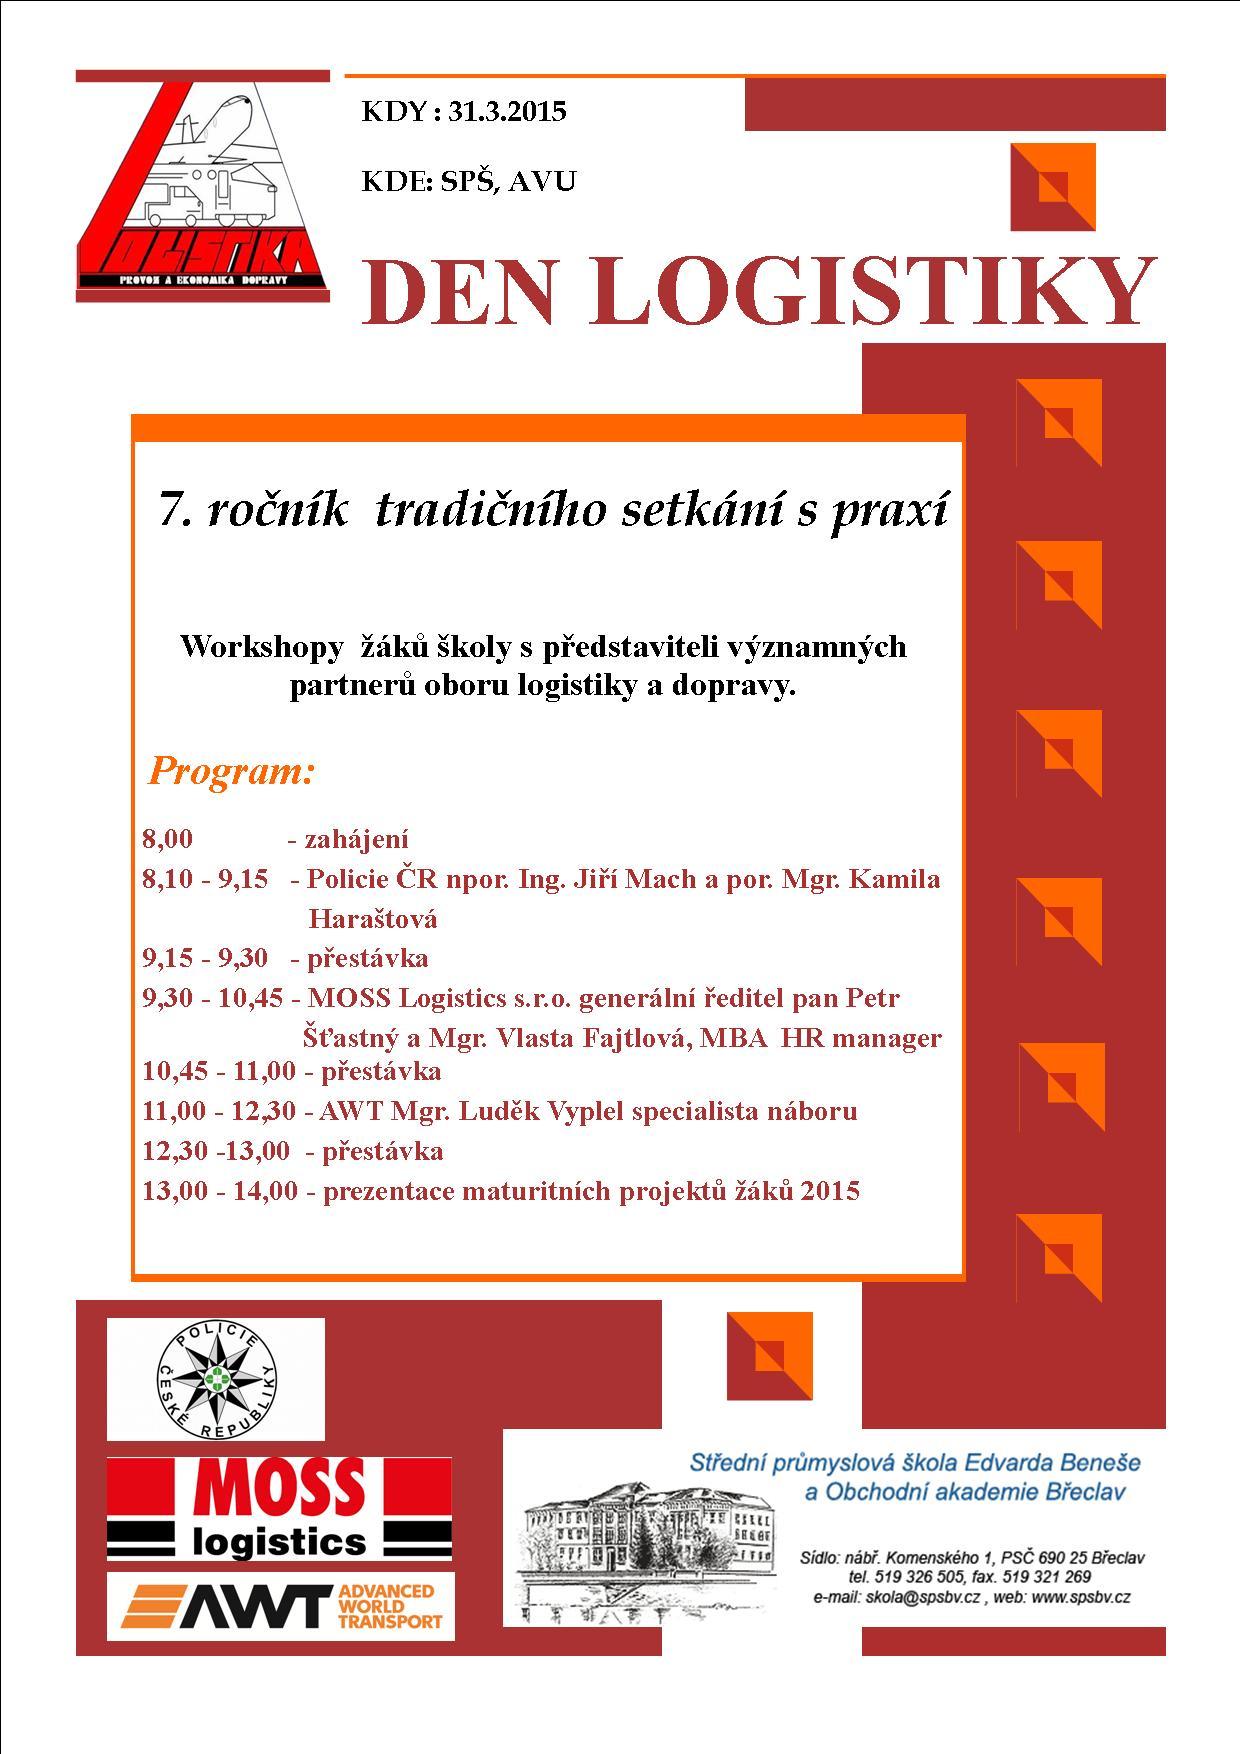 Den logistiky 2015